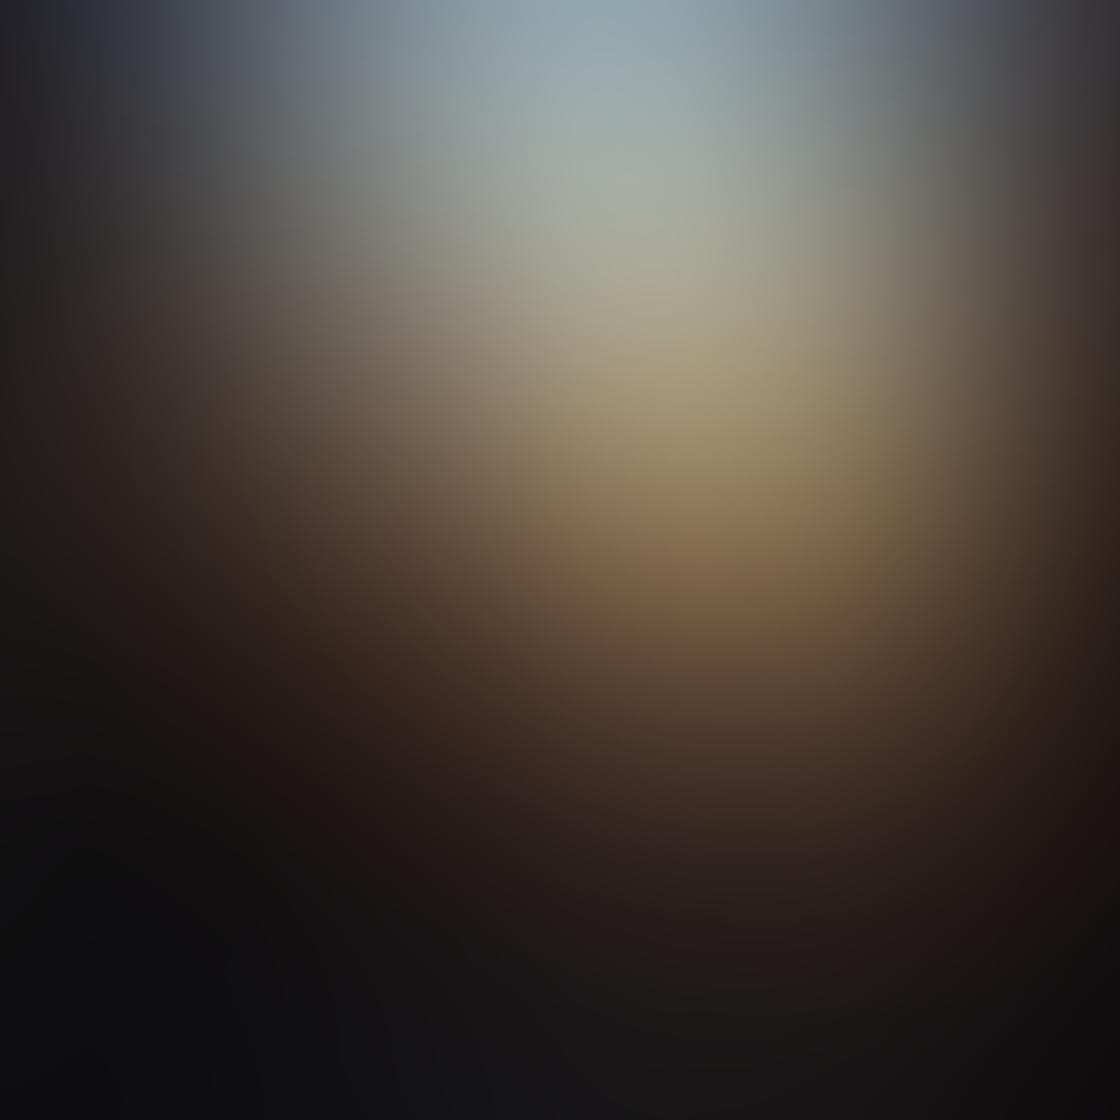 iPhone Reflection Photo 12